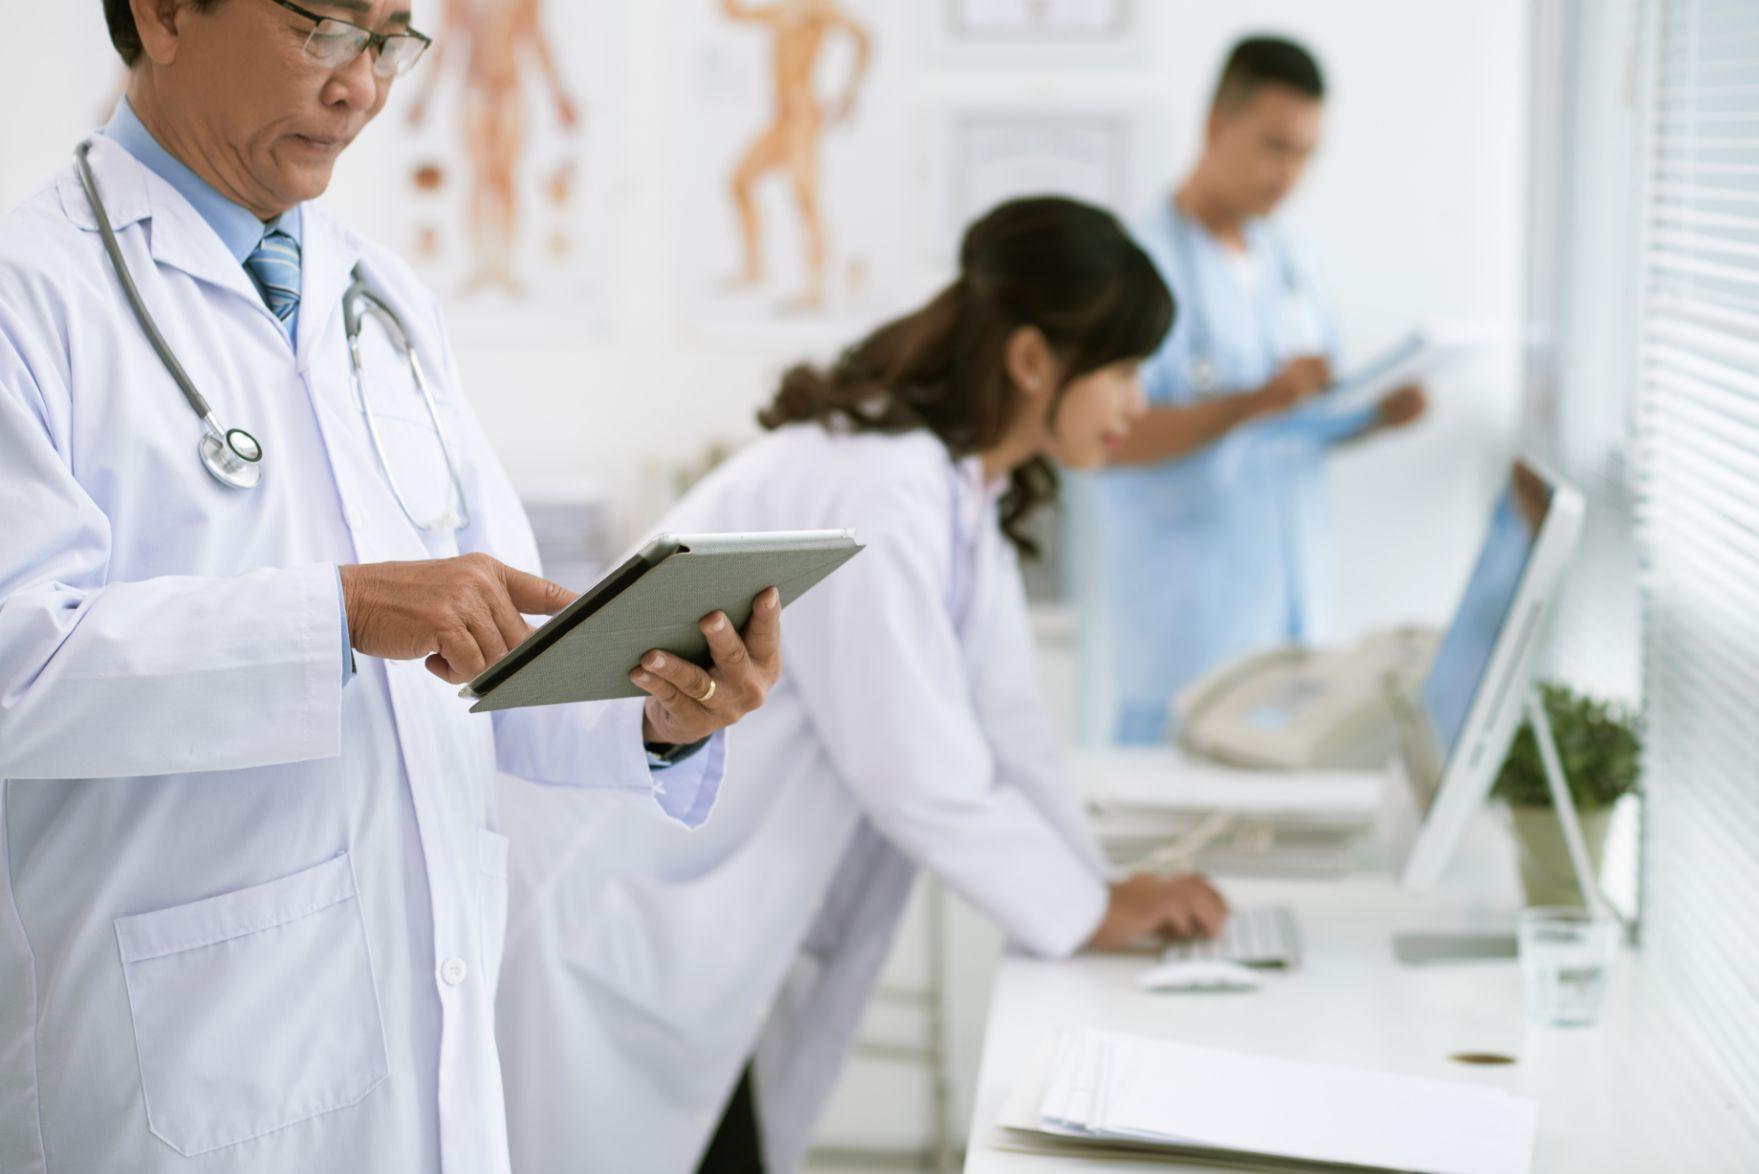 technology in medicine concept BBXHHVZ